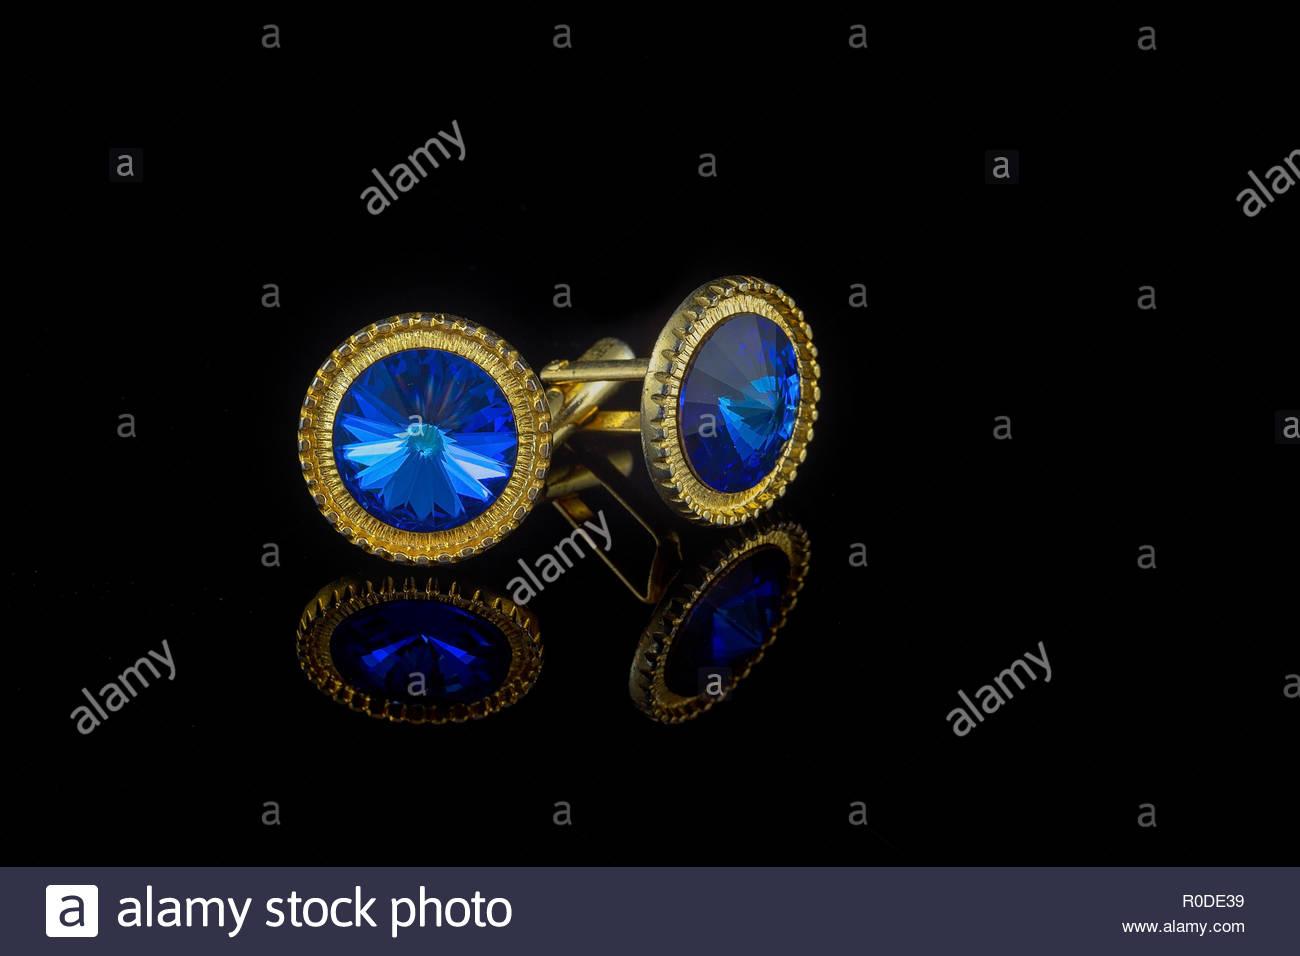 Vintage large gold blue stone cuff links on black background - Stock Image